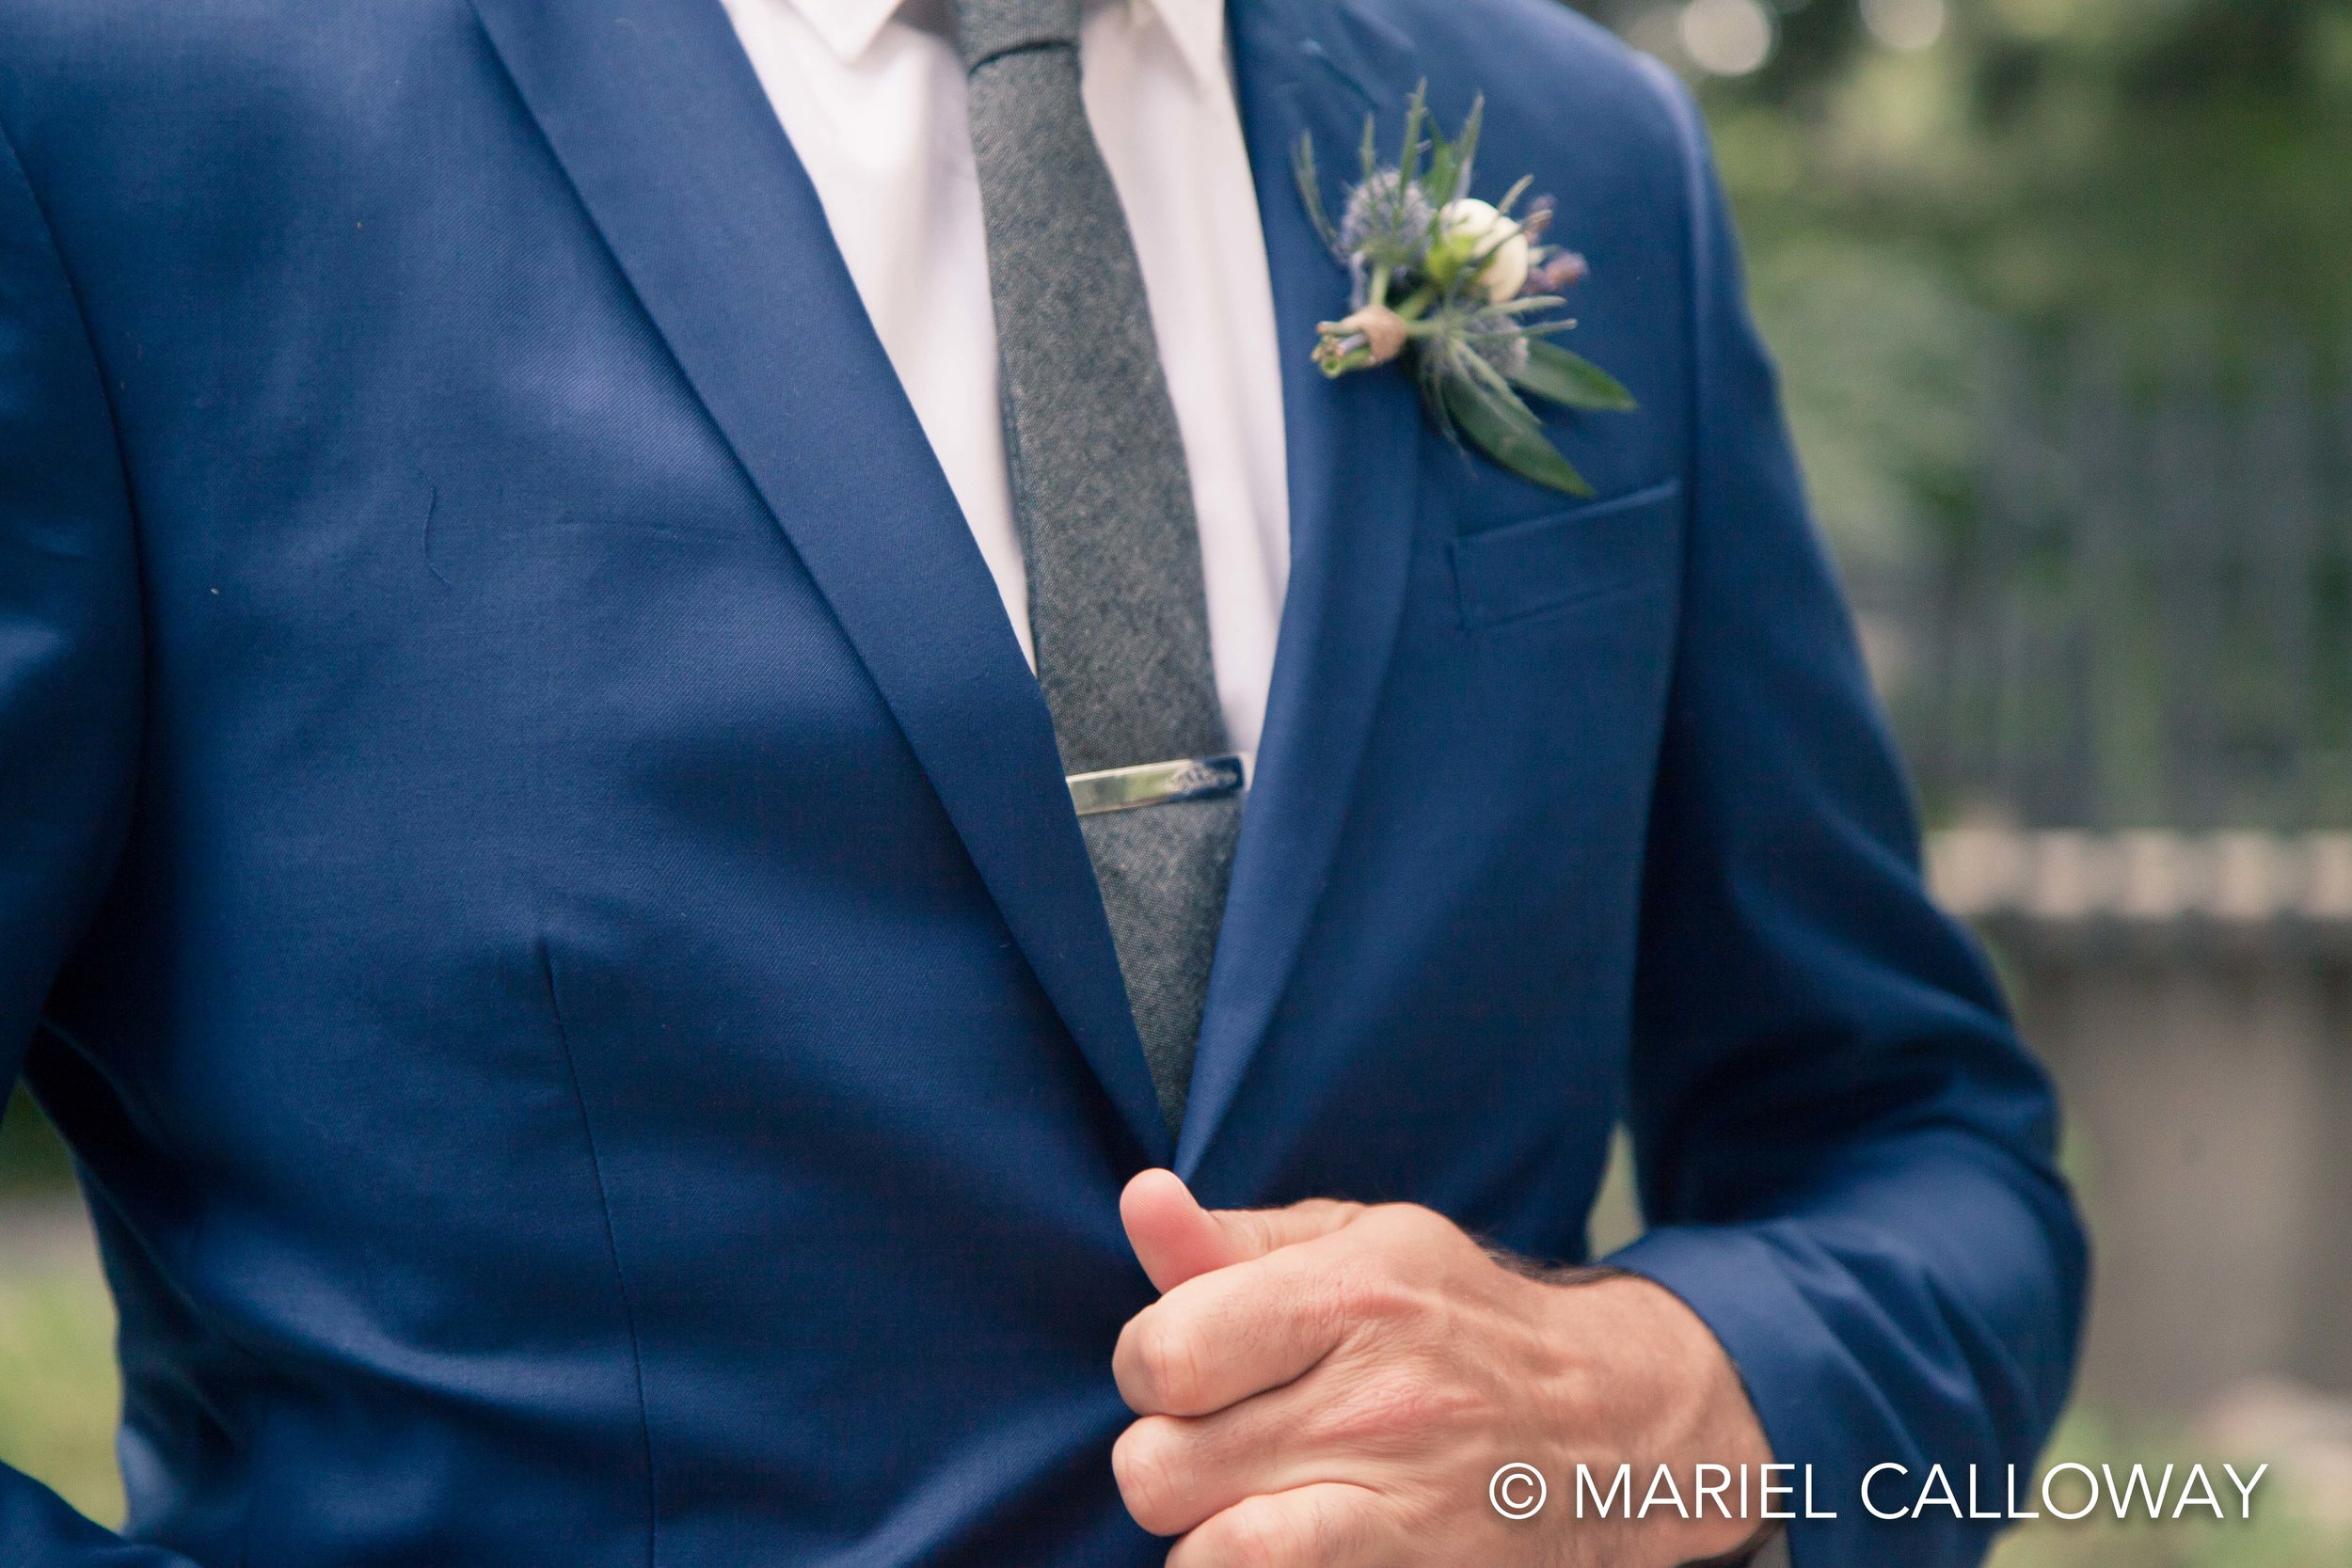 Mariel-Calloway-Los-Angeles-Wedding-Photography-Smith-7.jpg